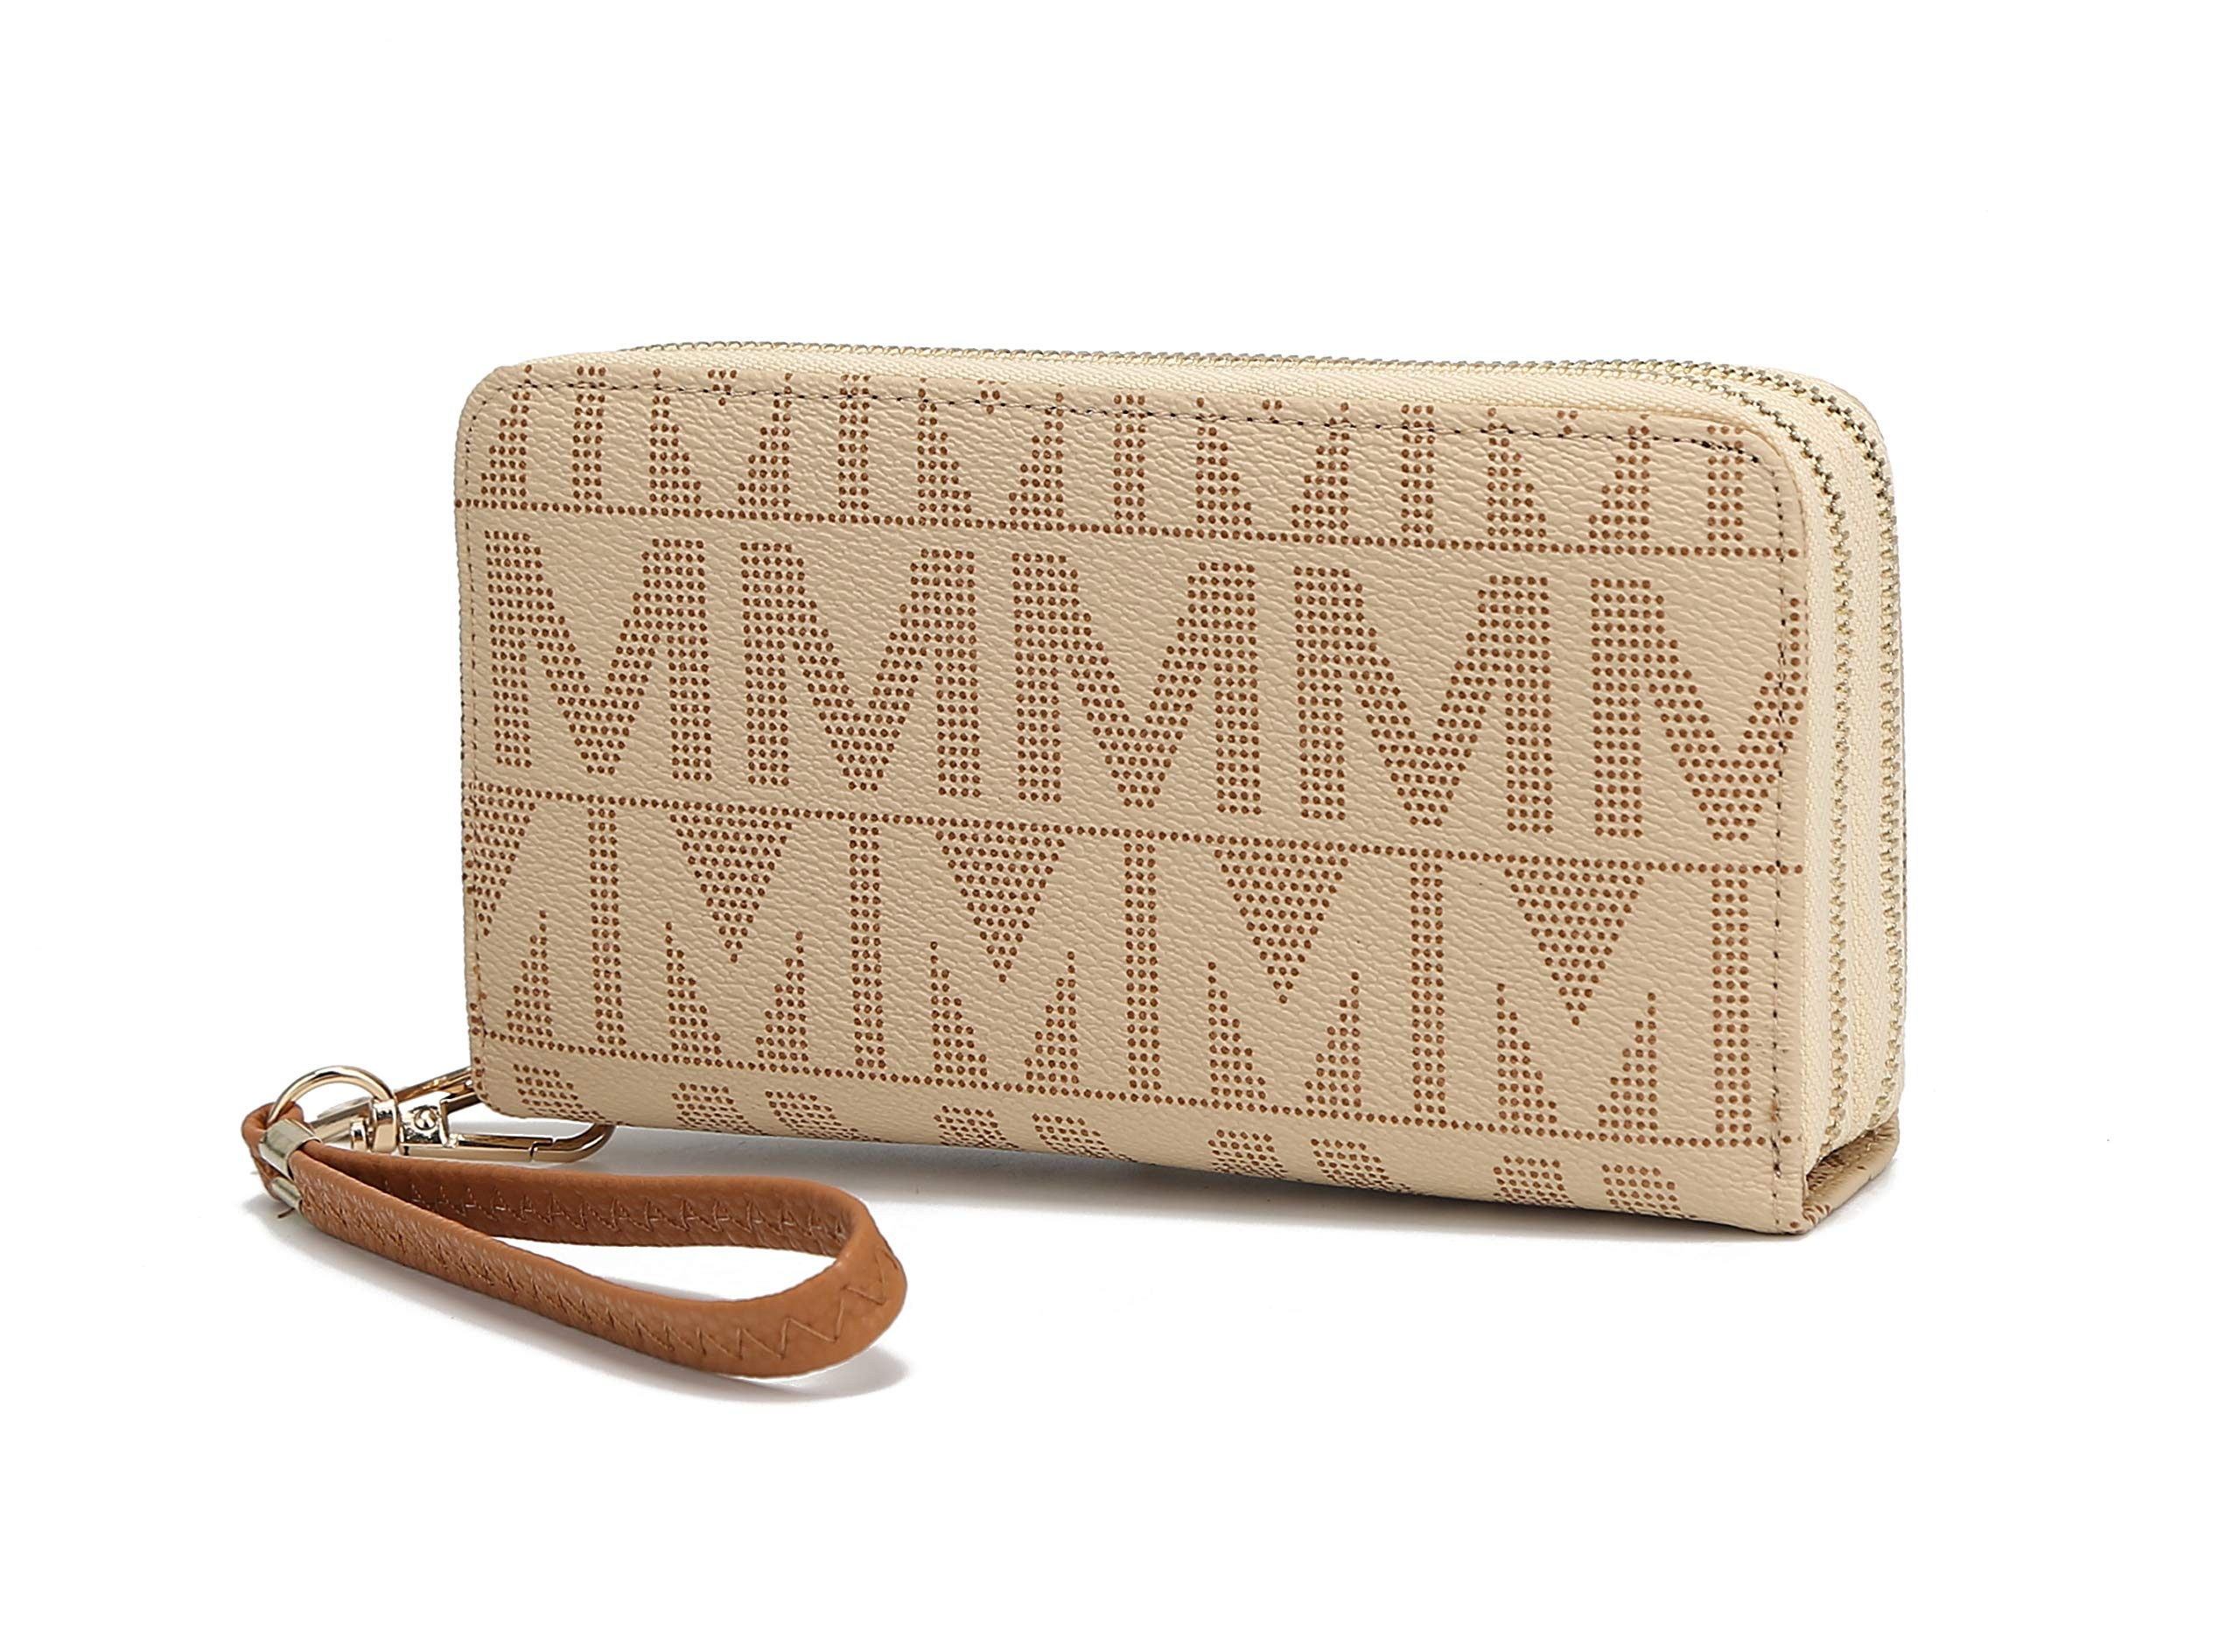 Mia K. Collection Wristlet Wallet for Women Small PU Leather Handbag - Double Zipper Bag Multi Pocket clutch Purse